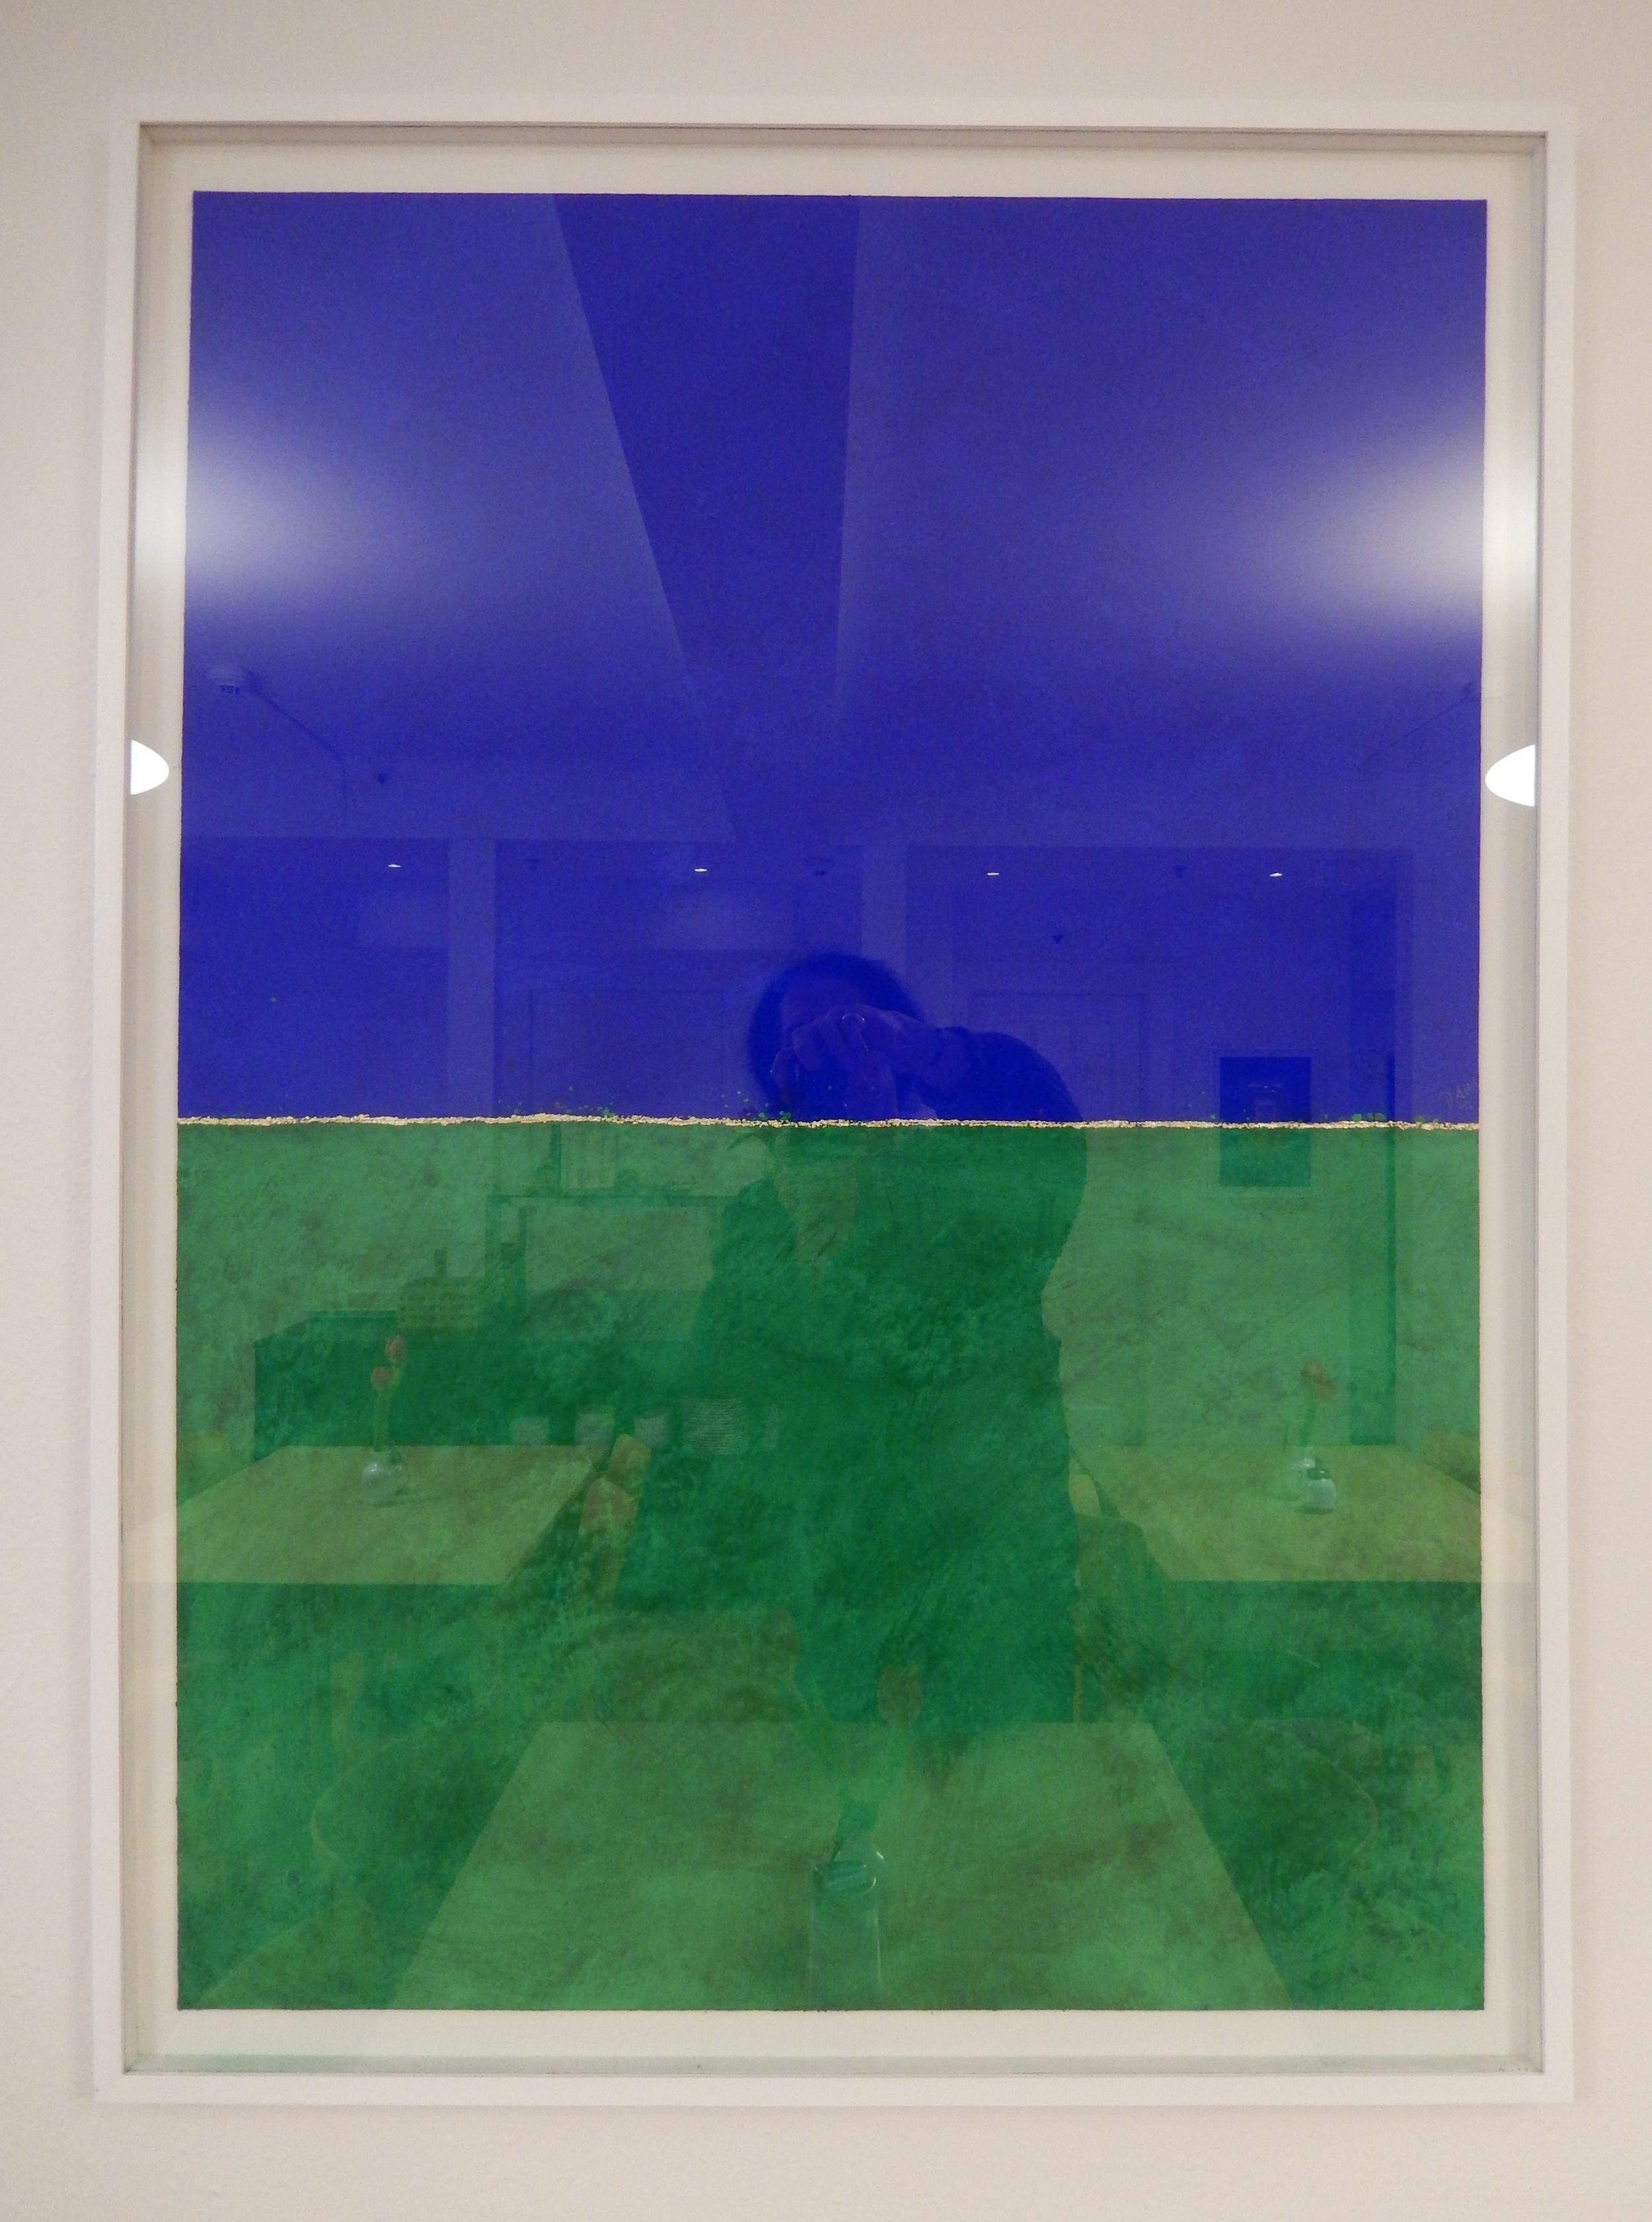 inbetween - green and blue